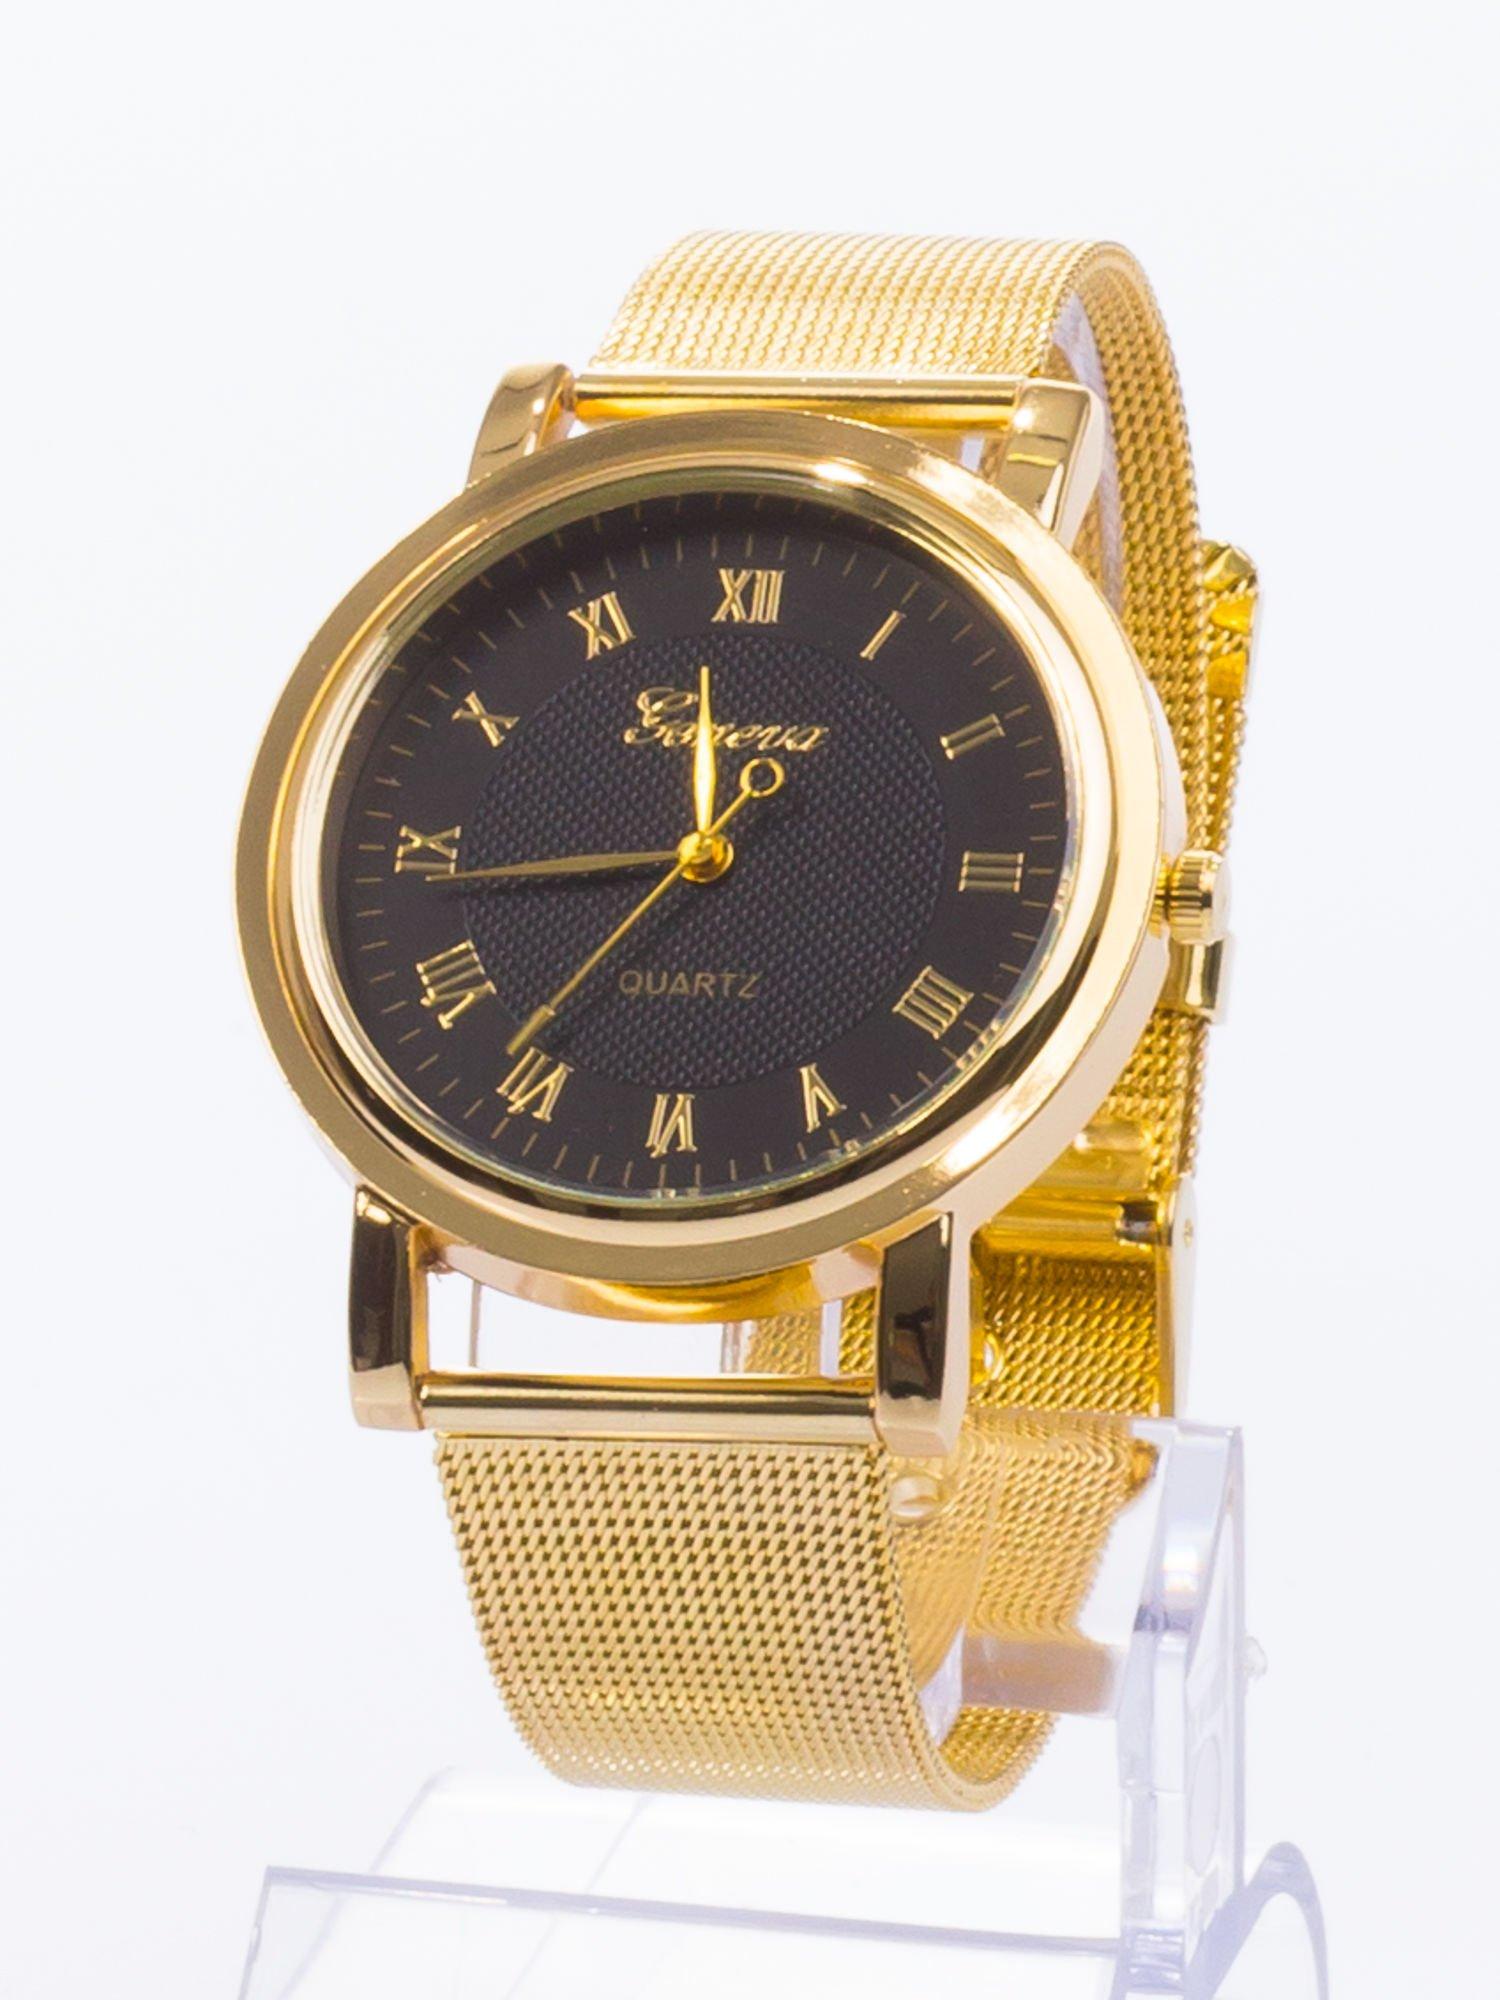 GENEVA Klasyczny zegarek Geneva metalowej bransolecie                                  zdj.                                  2